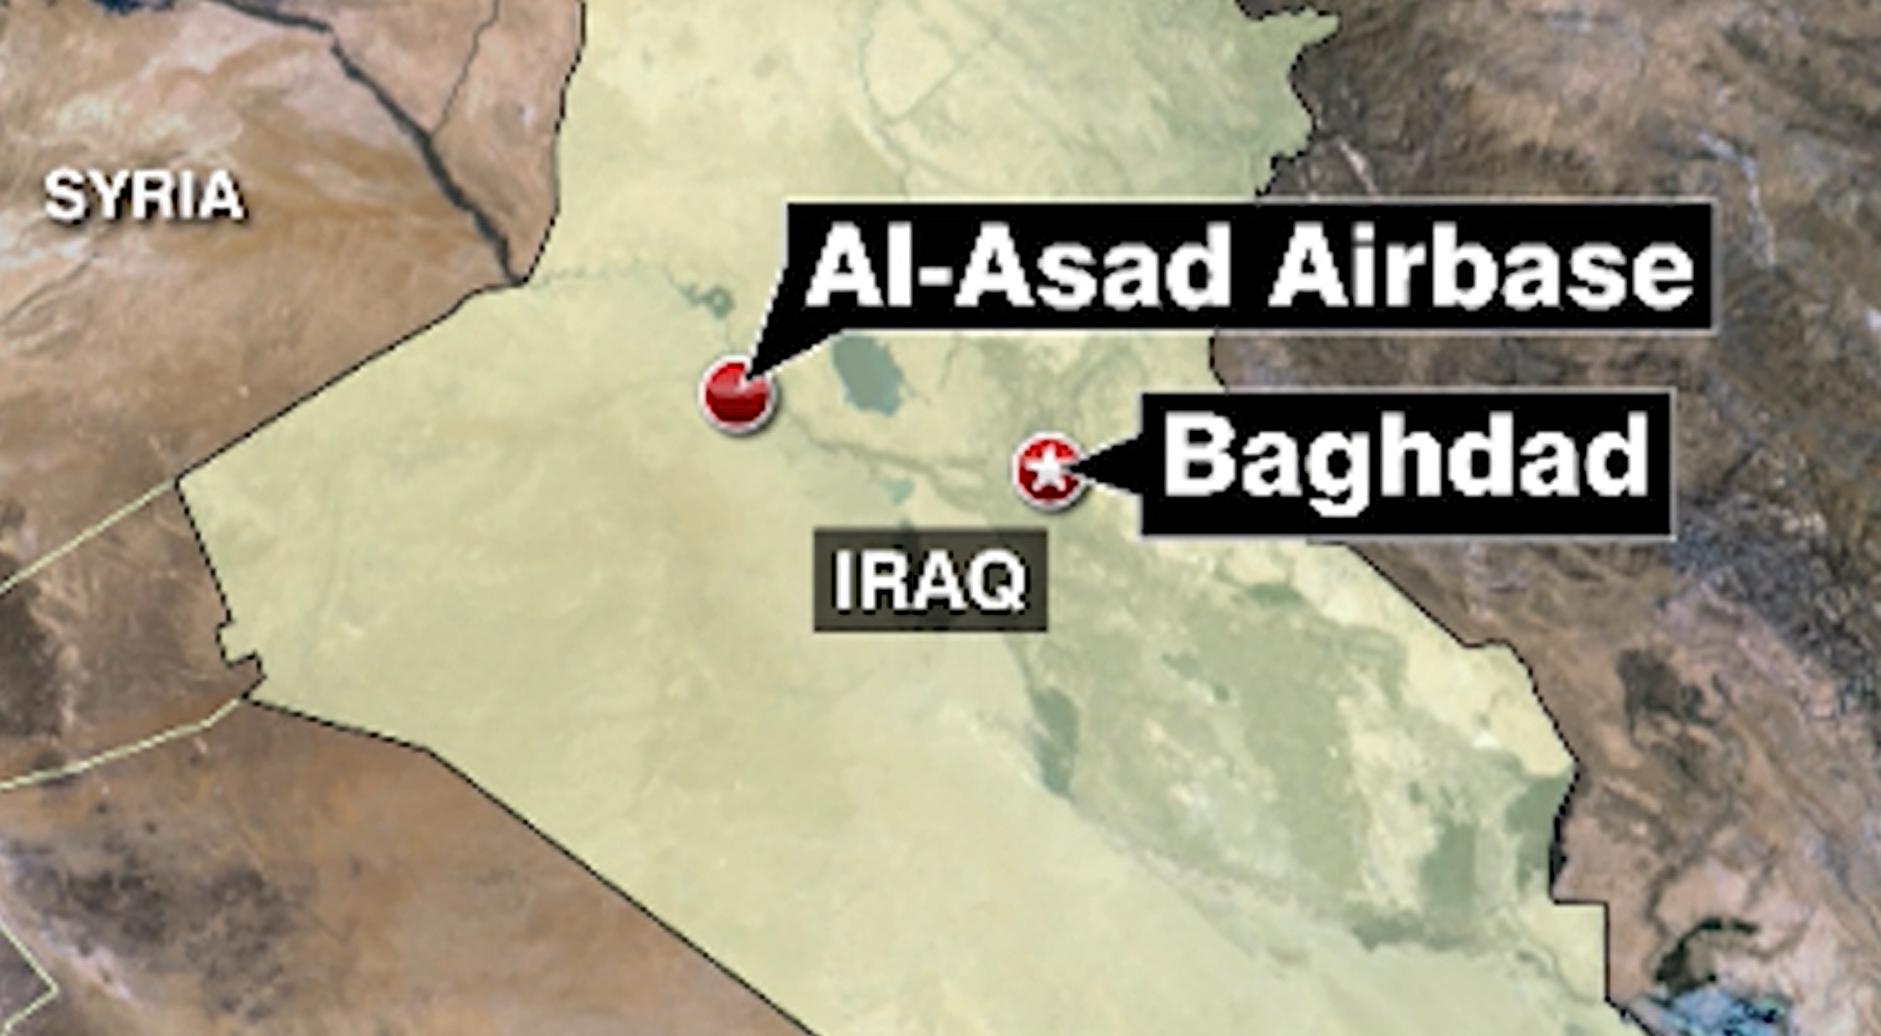 MAP: MISSILES LAND AT AIRBASE HOSTING U-S TROOPS